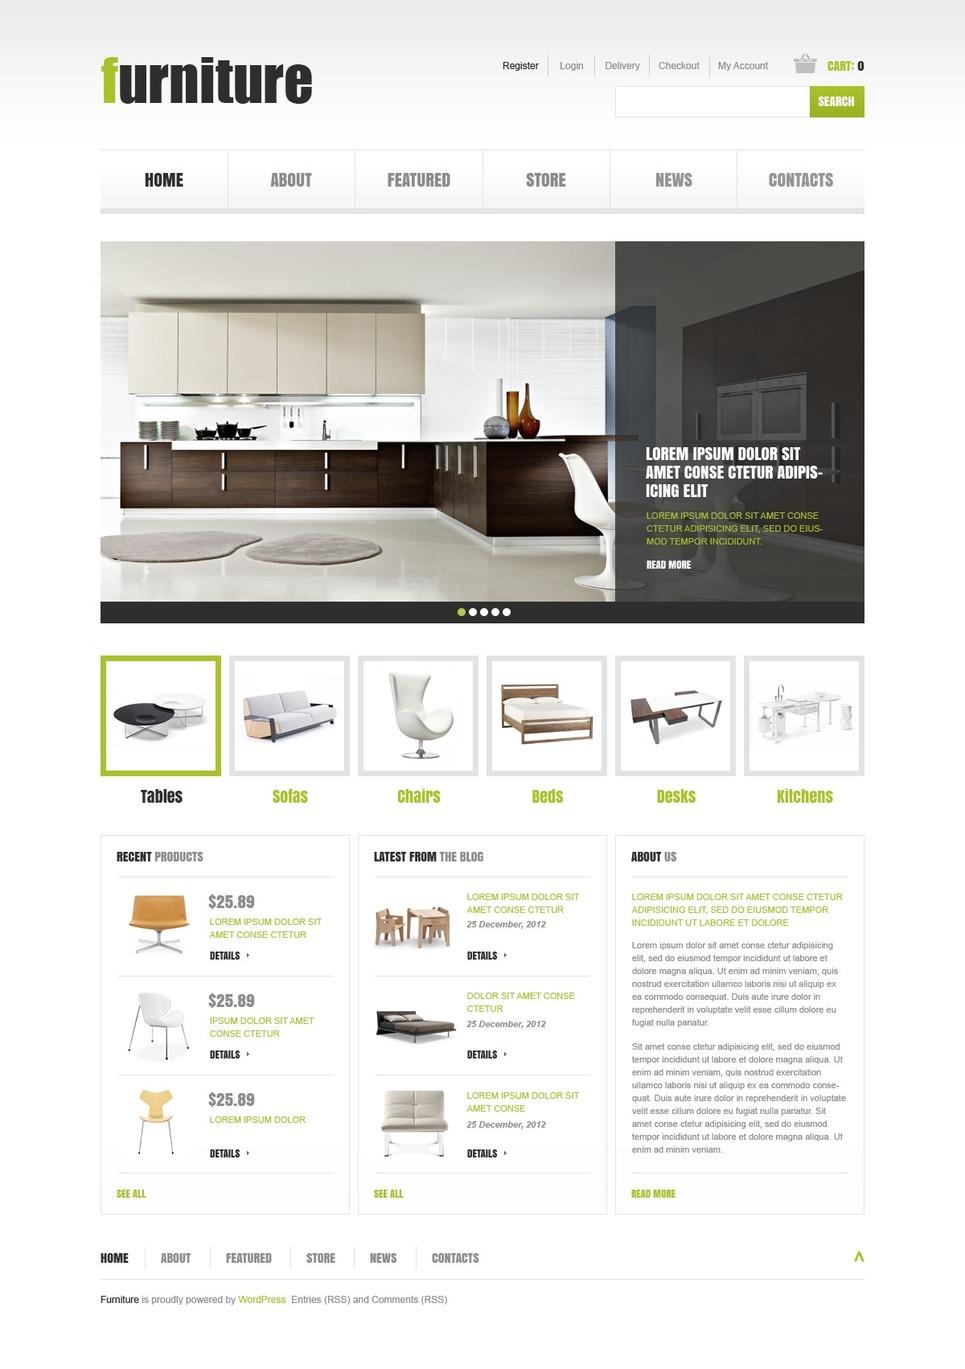 Effective Furniture Store JigoShop Theme